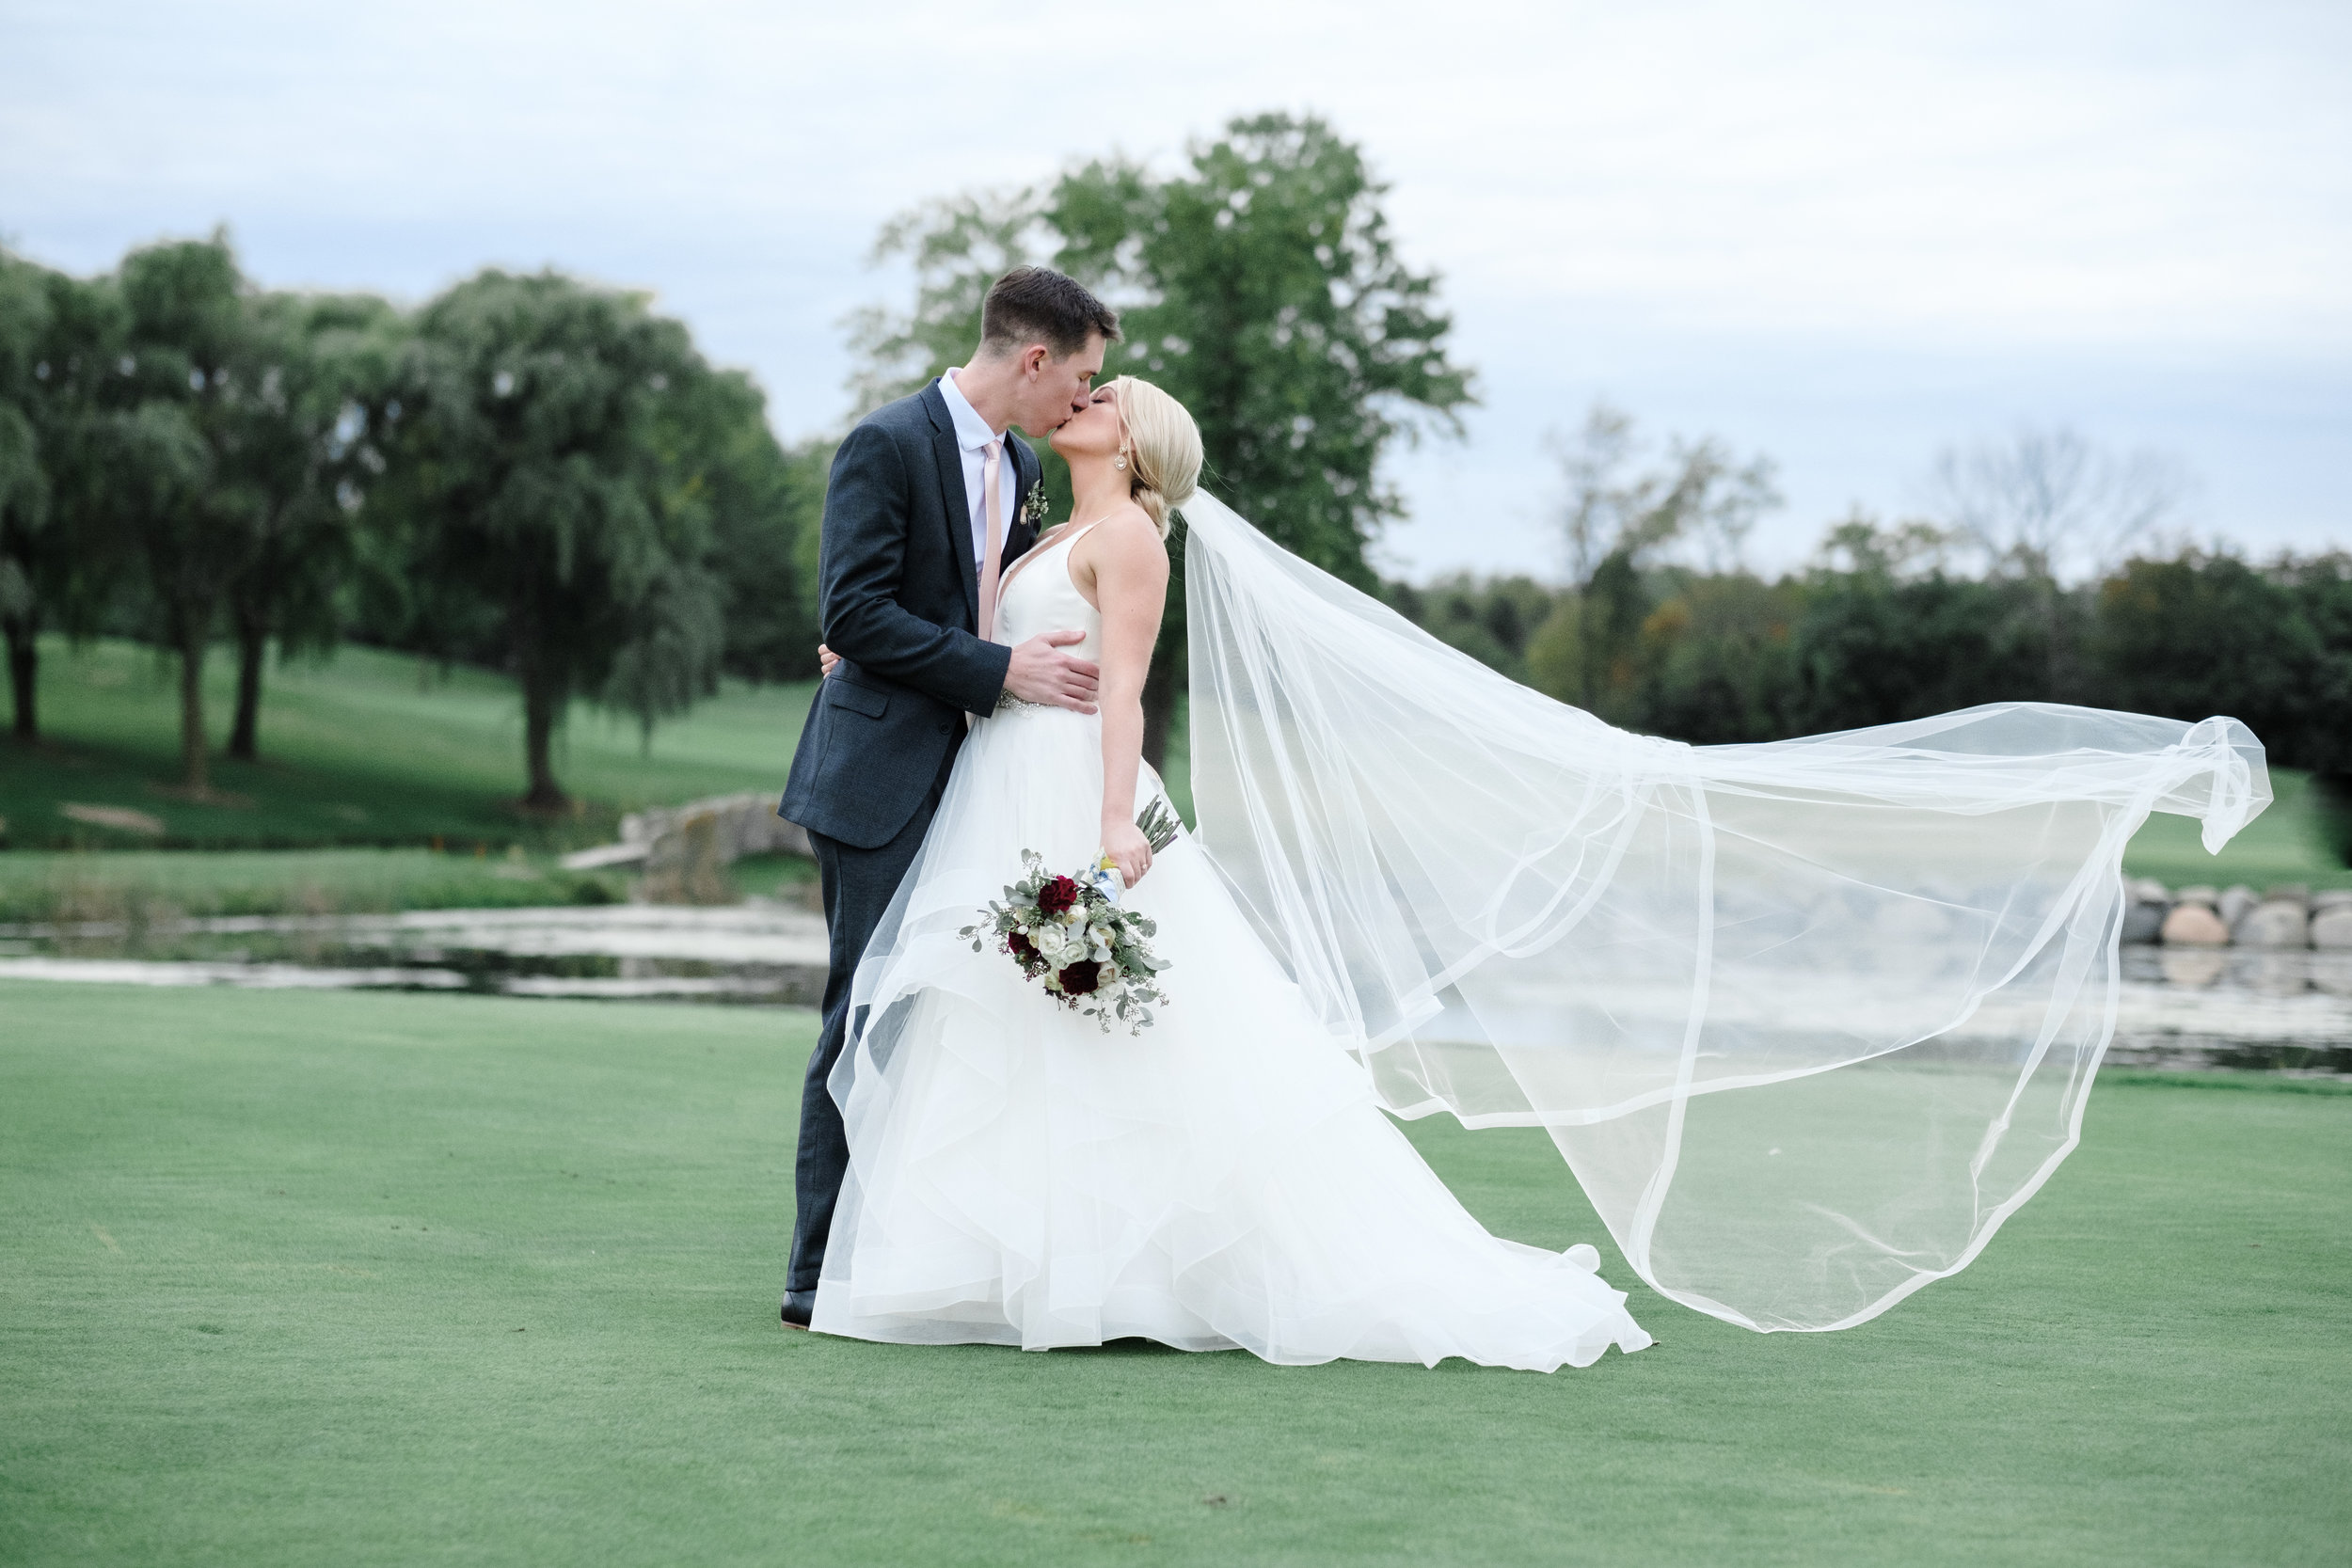 18-09-29 Brittany-Jake Rockford Bank And Trust Pavilion Wedding-345.jpg